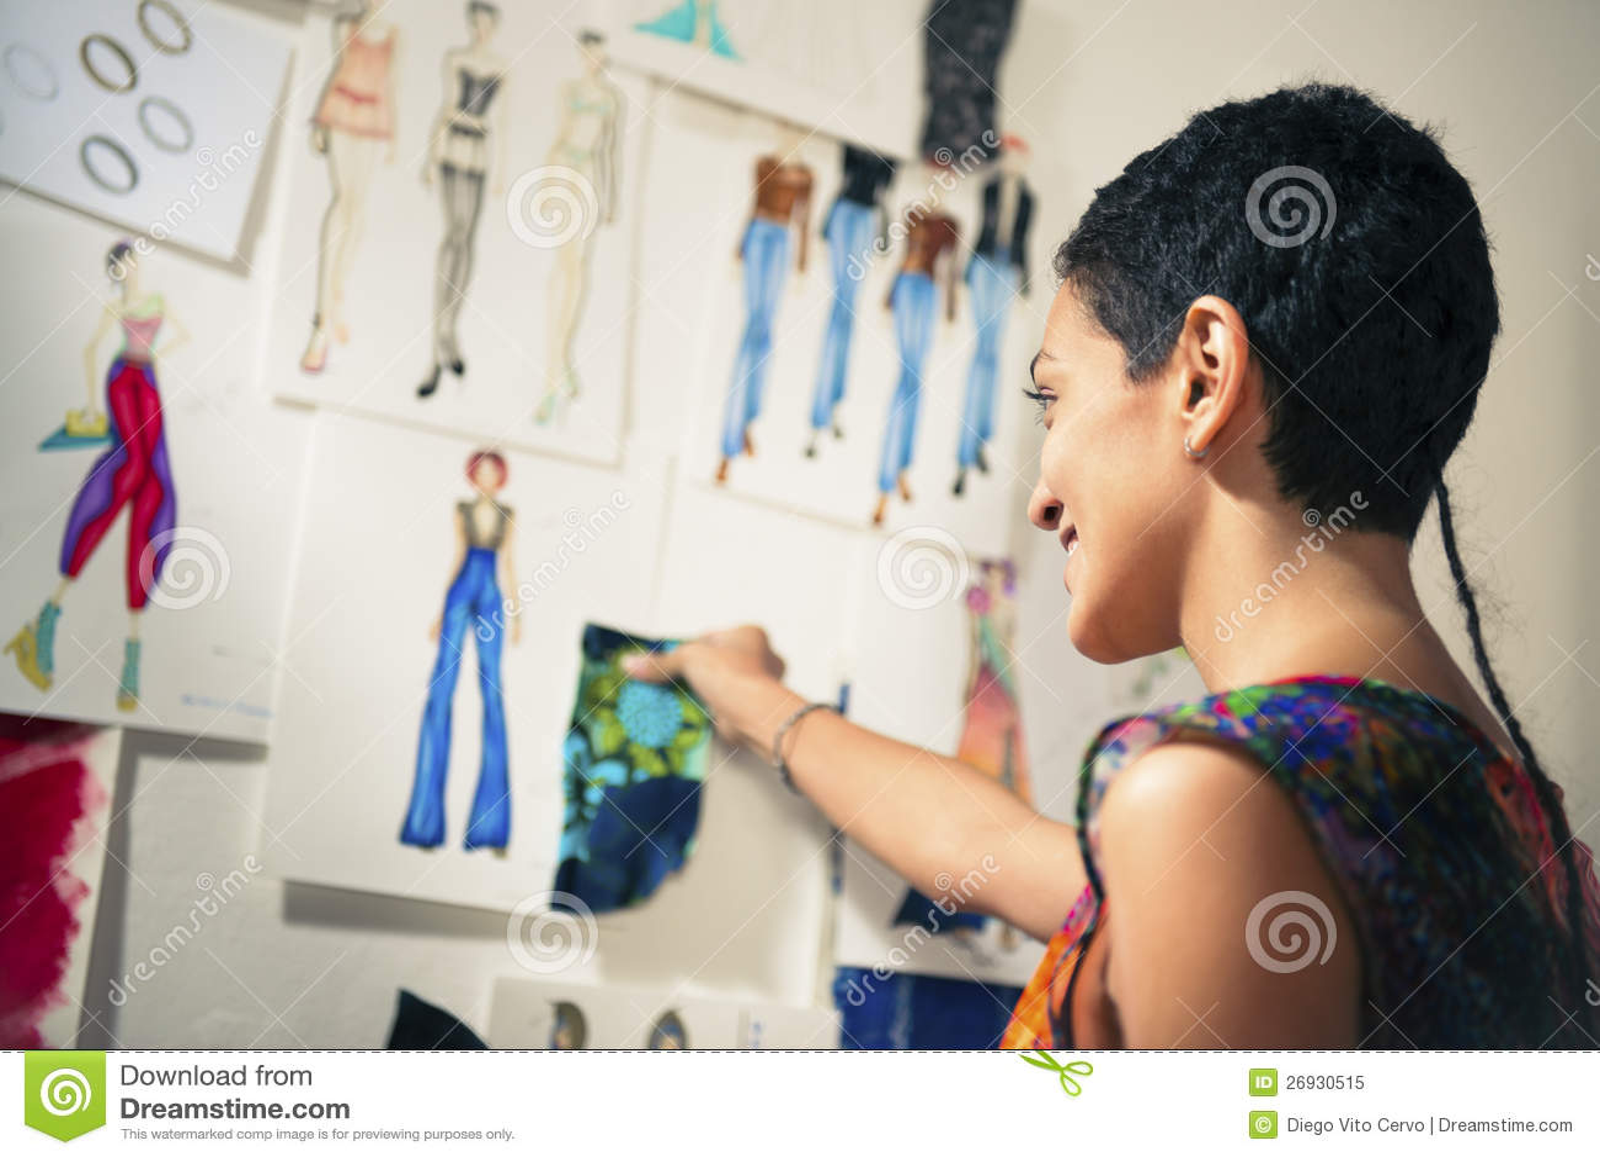 Fashion designer contemplating drawings in studio